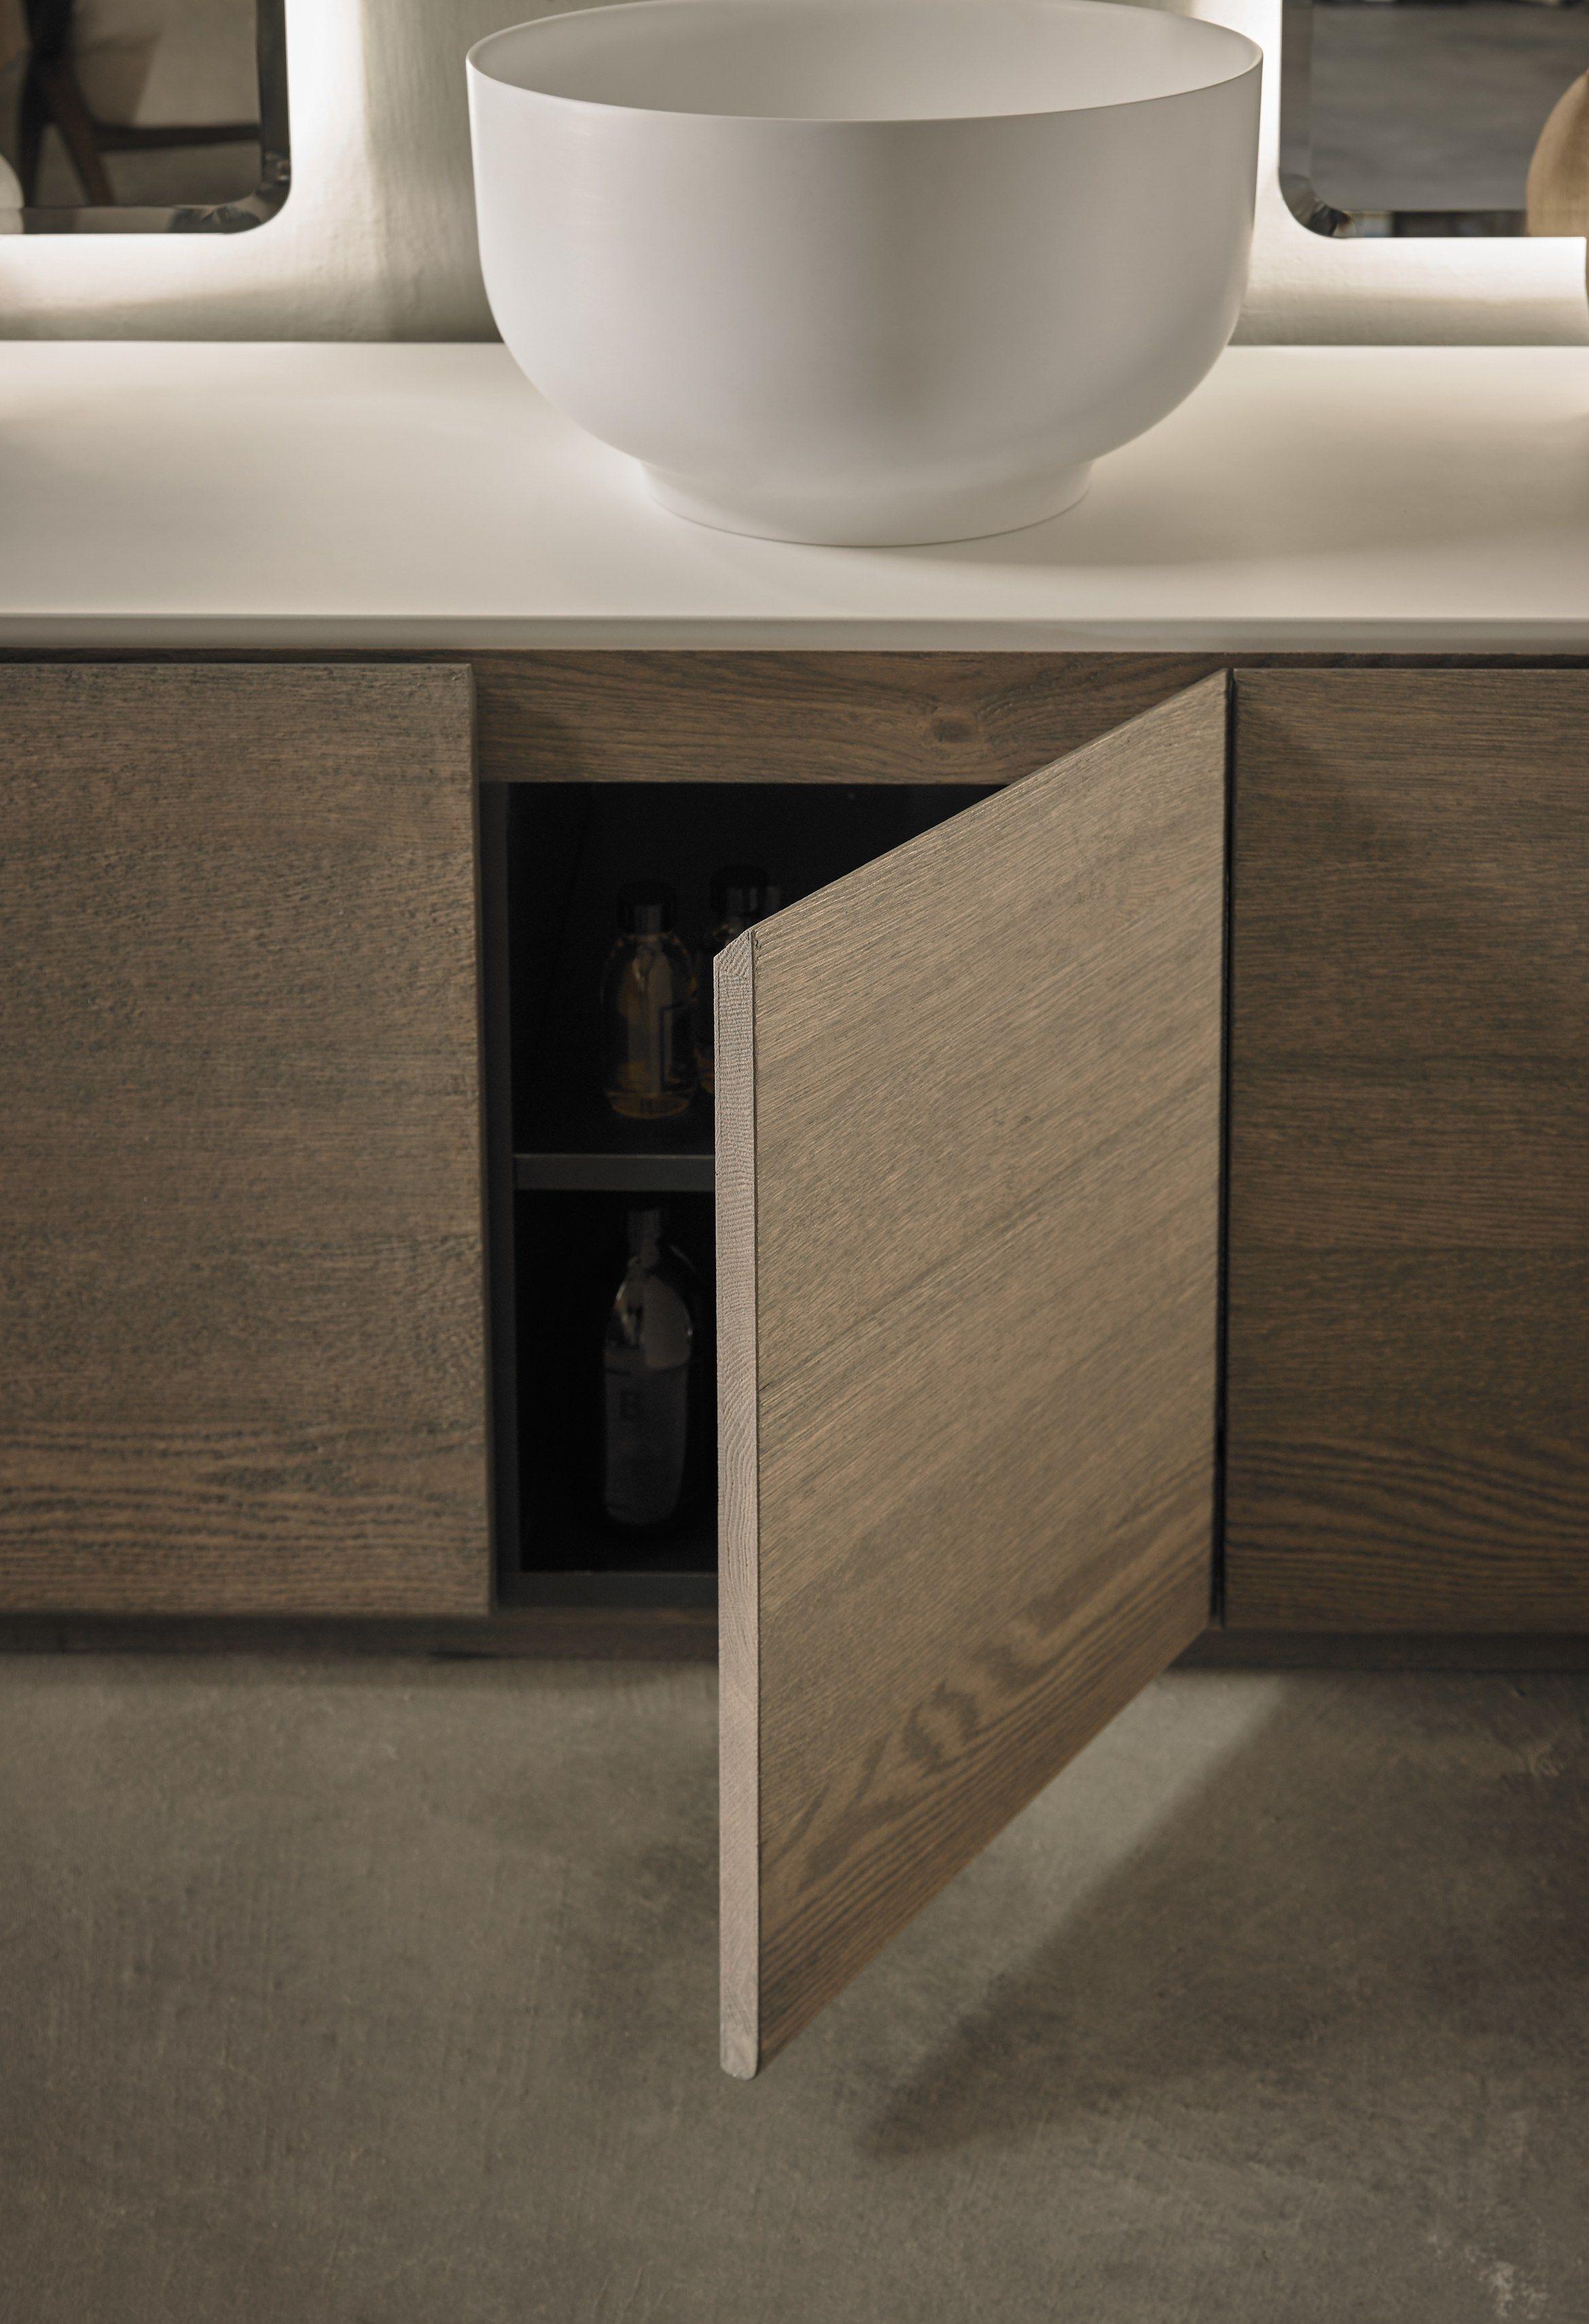 origin   mueble bajo lavabo doble by inbani diseño seung-yong song ... - Muebles De Lavabo De Diseno